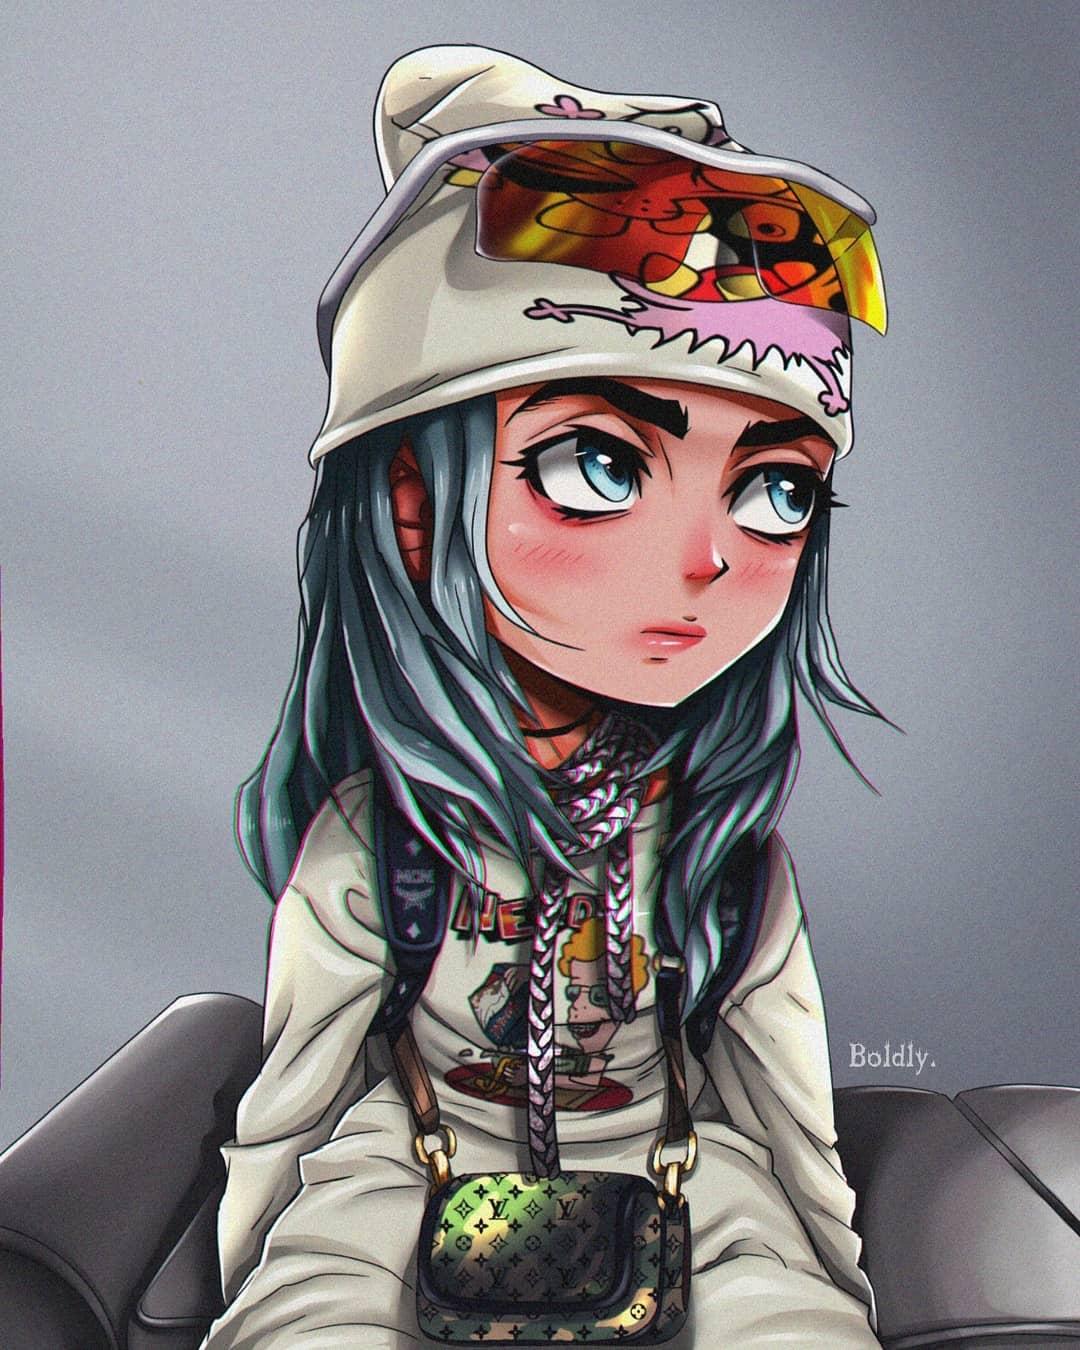 Billie Eilish Cartoon Anime Wallpapers Wallpaper Cave